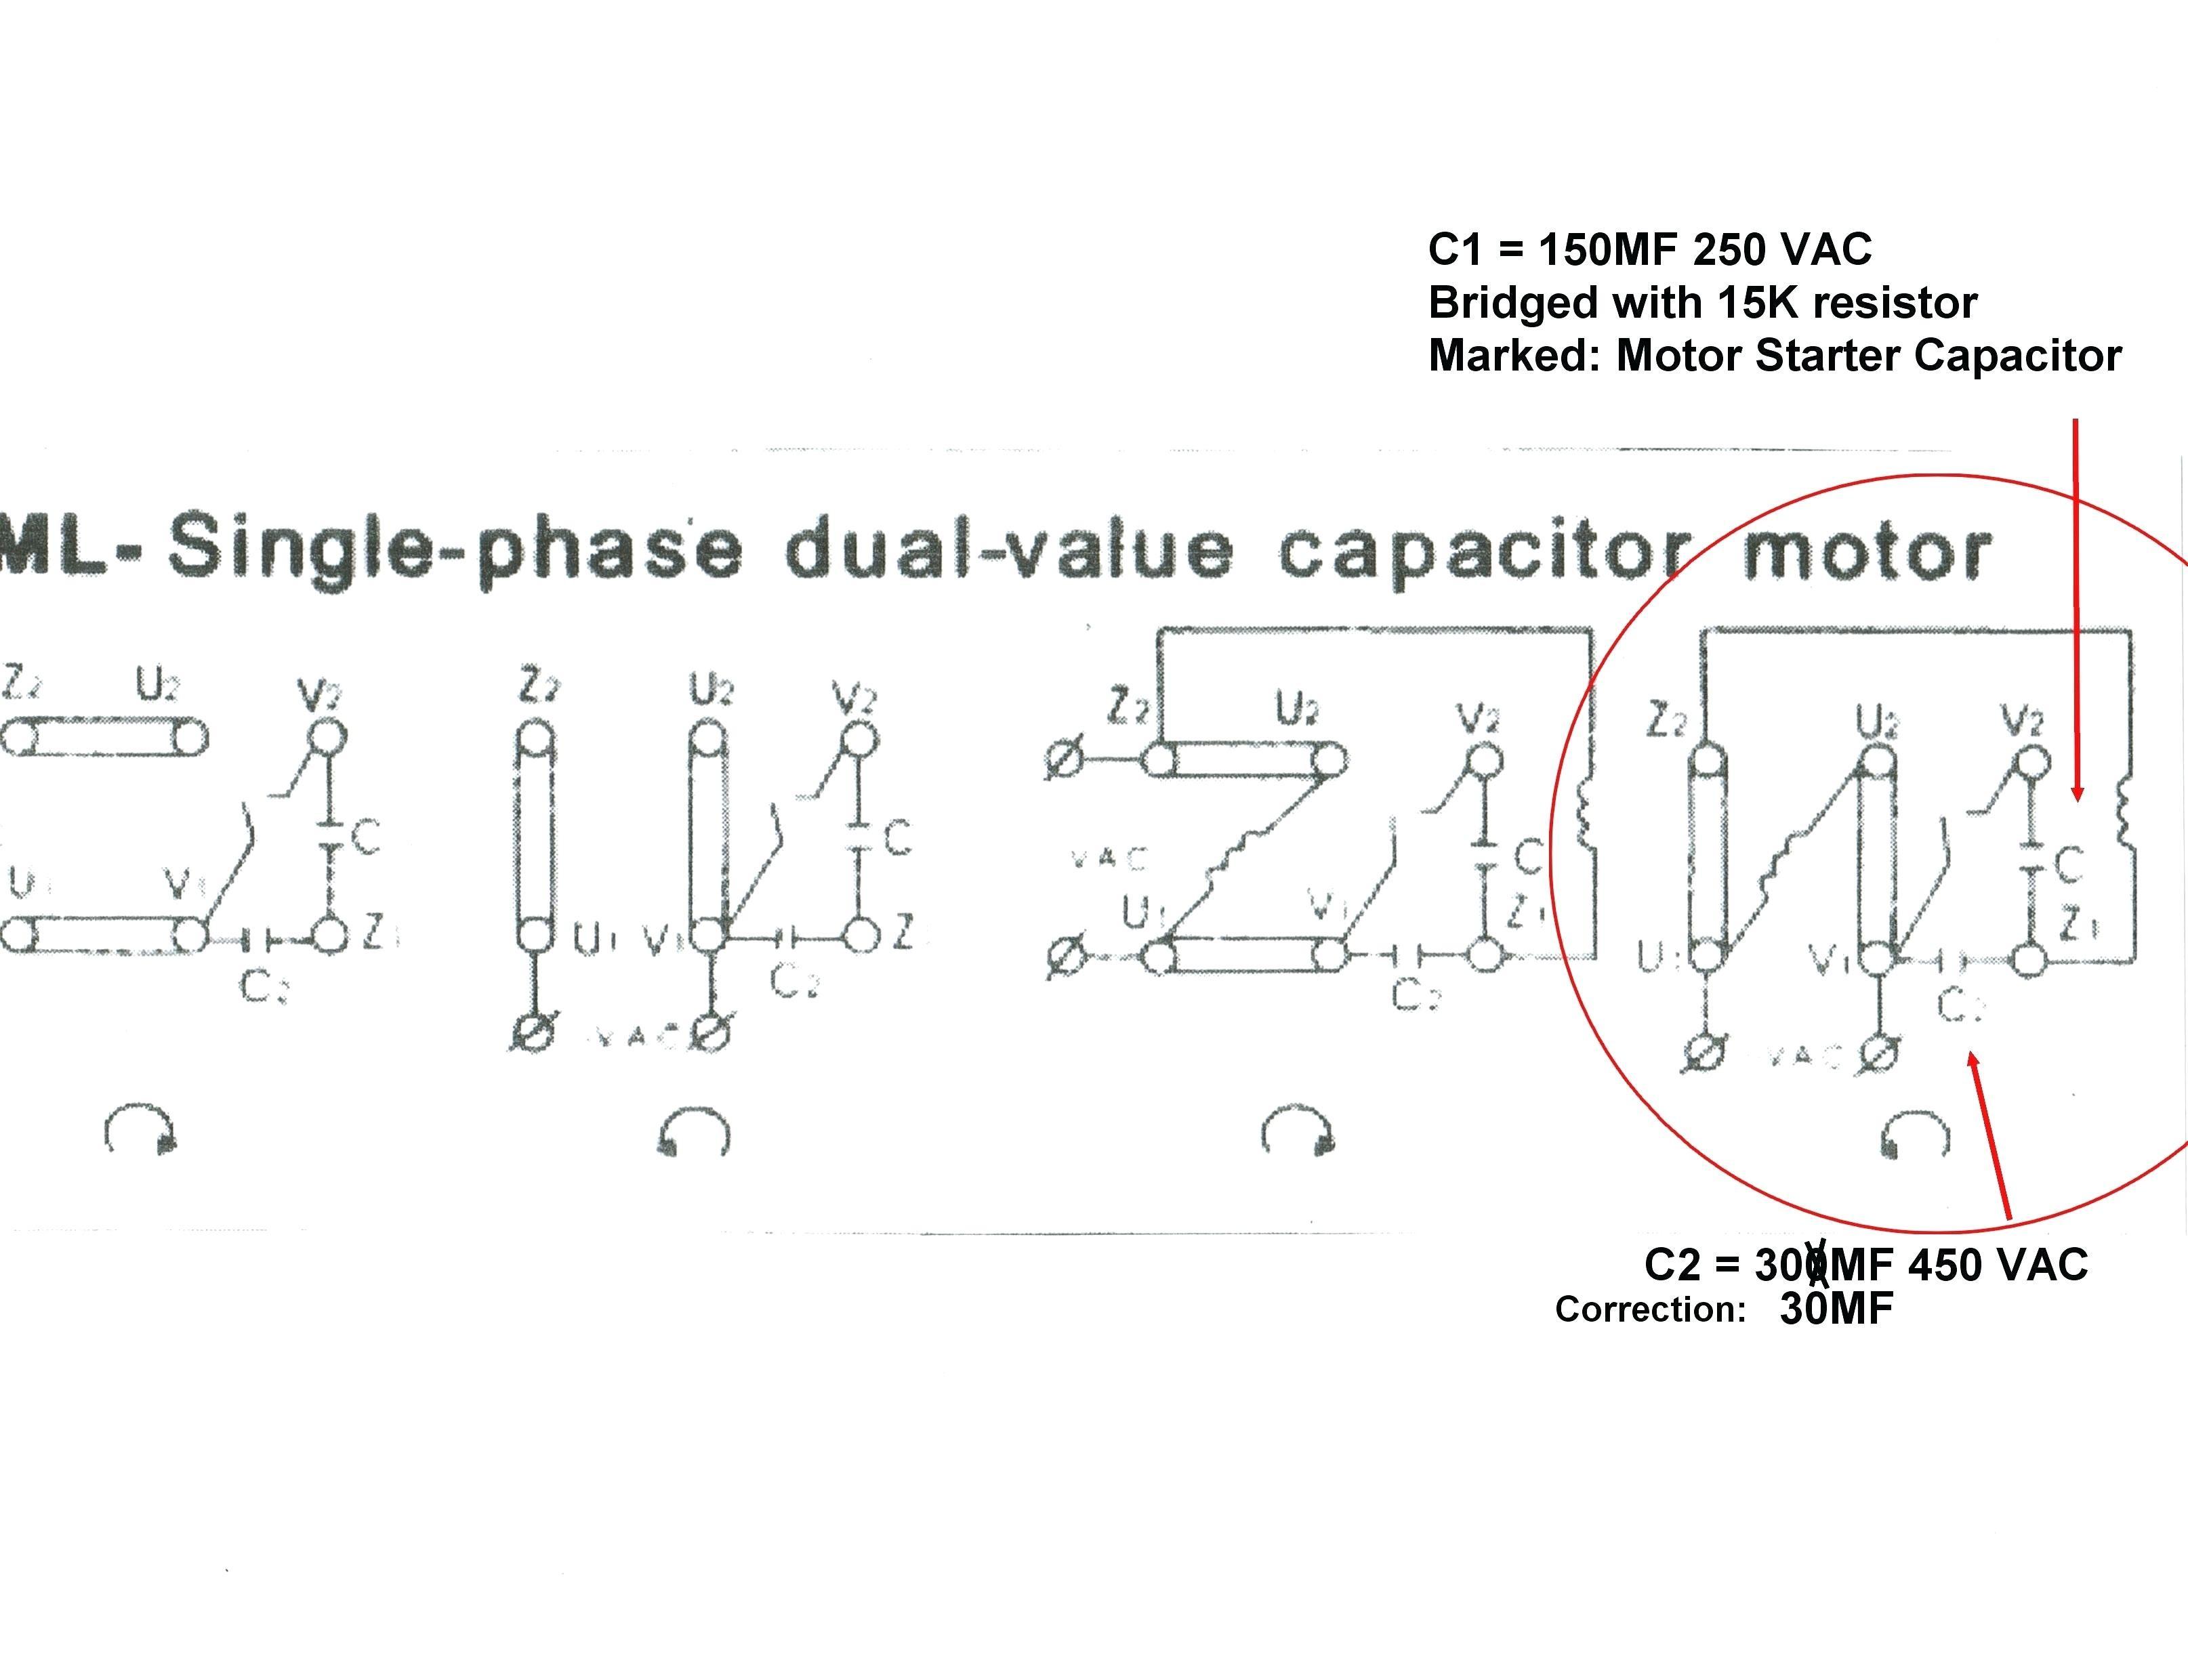 WRG-4272] Datsun Roadster Wiring Diagram on